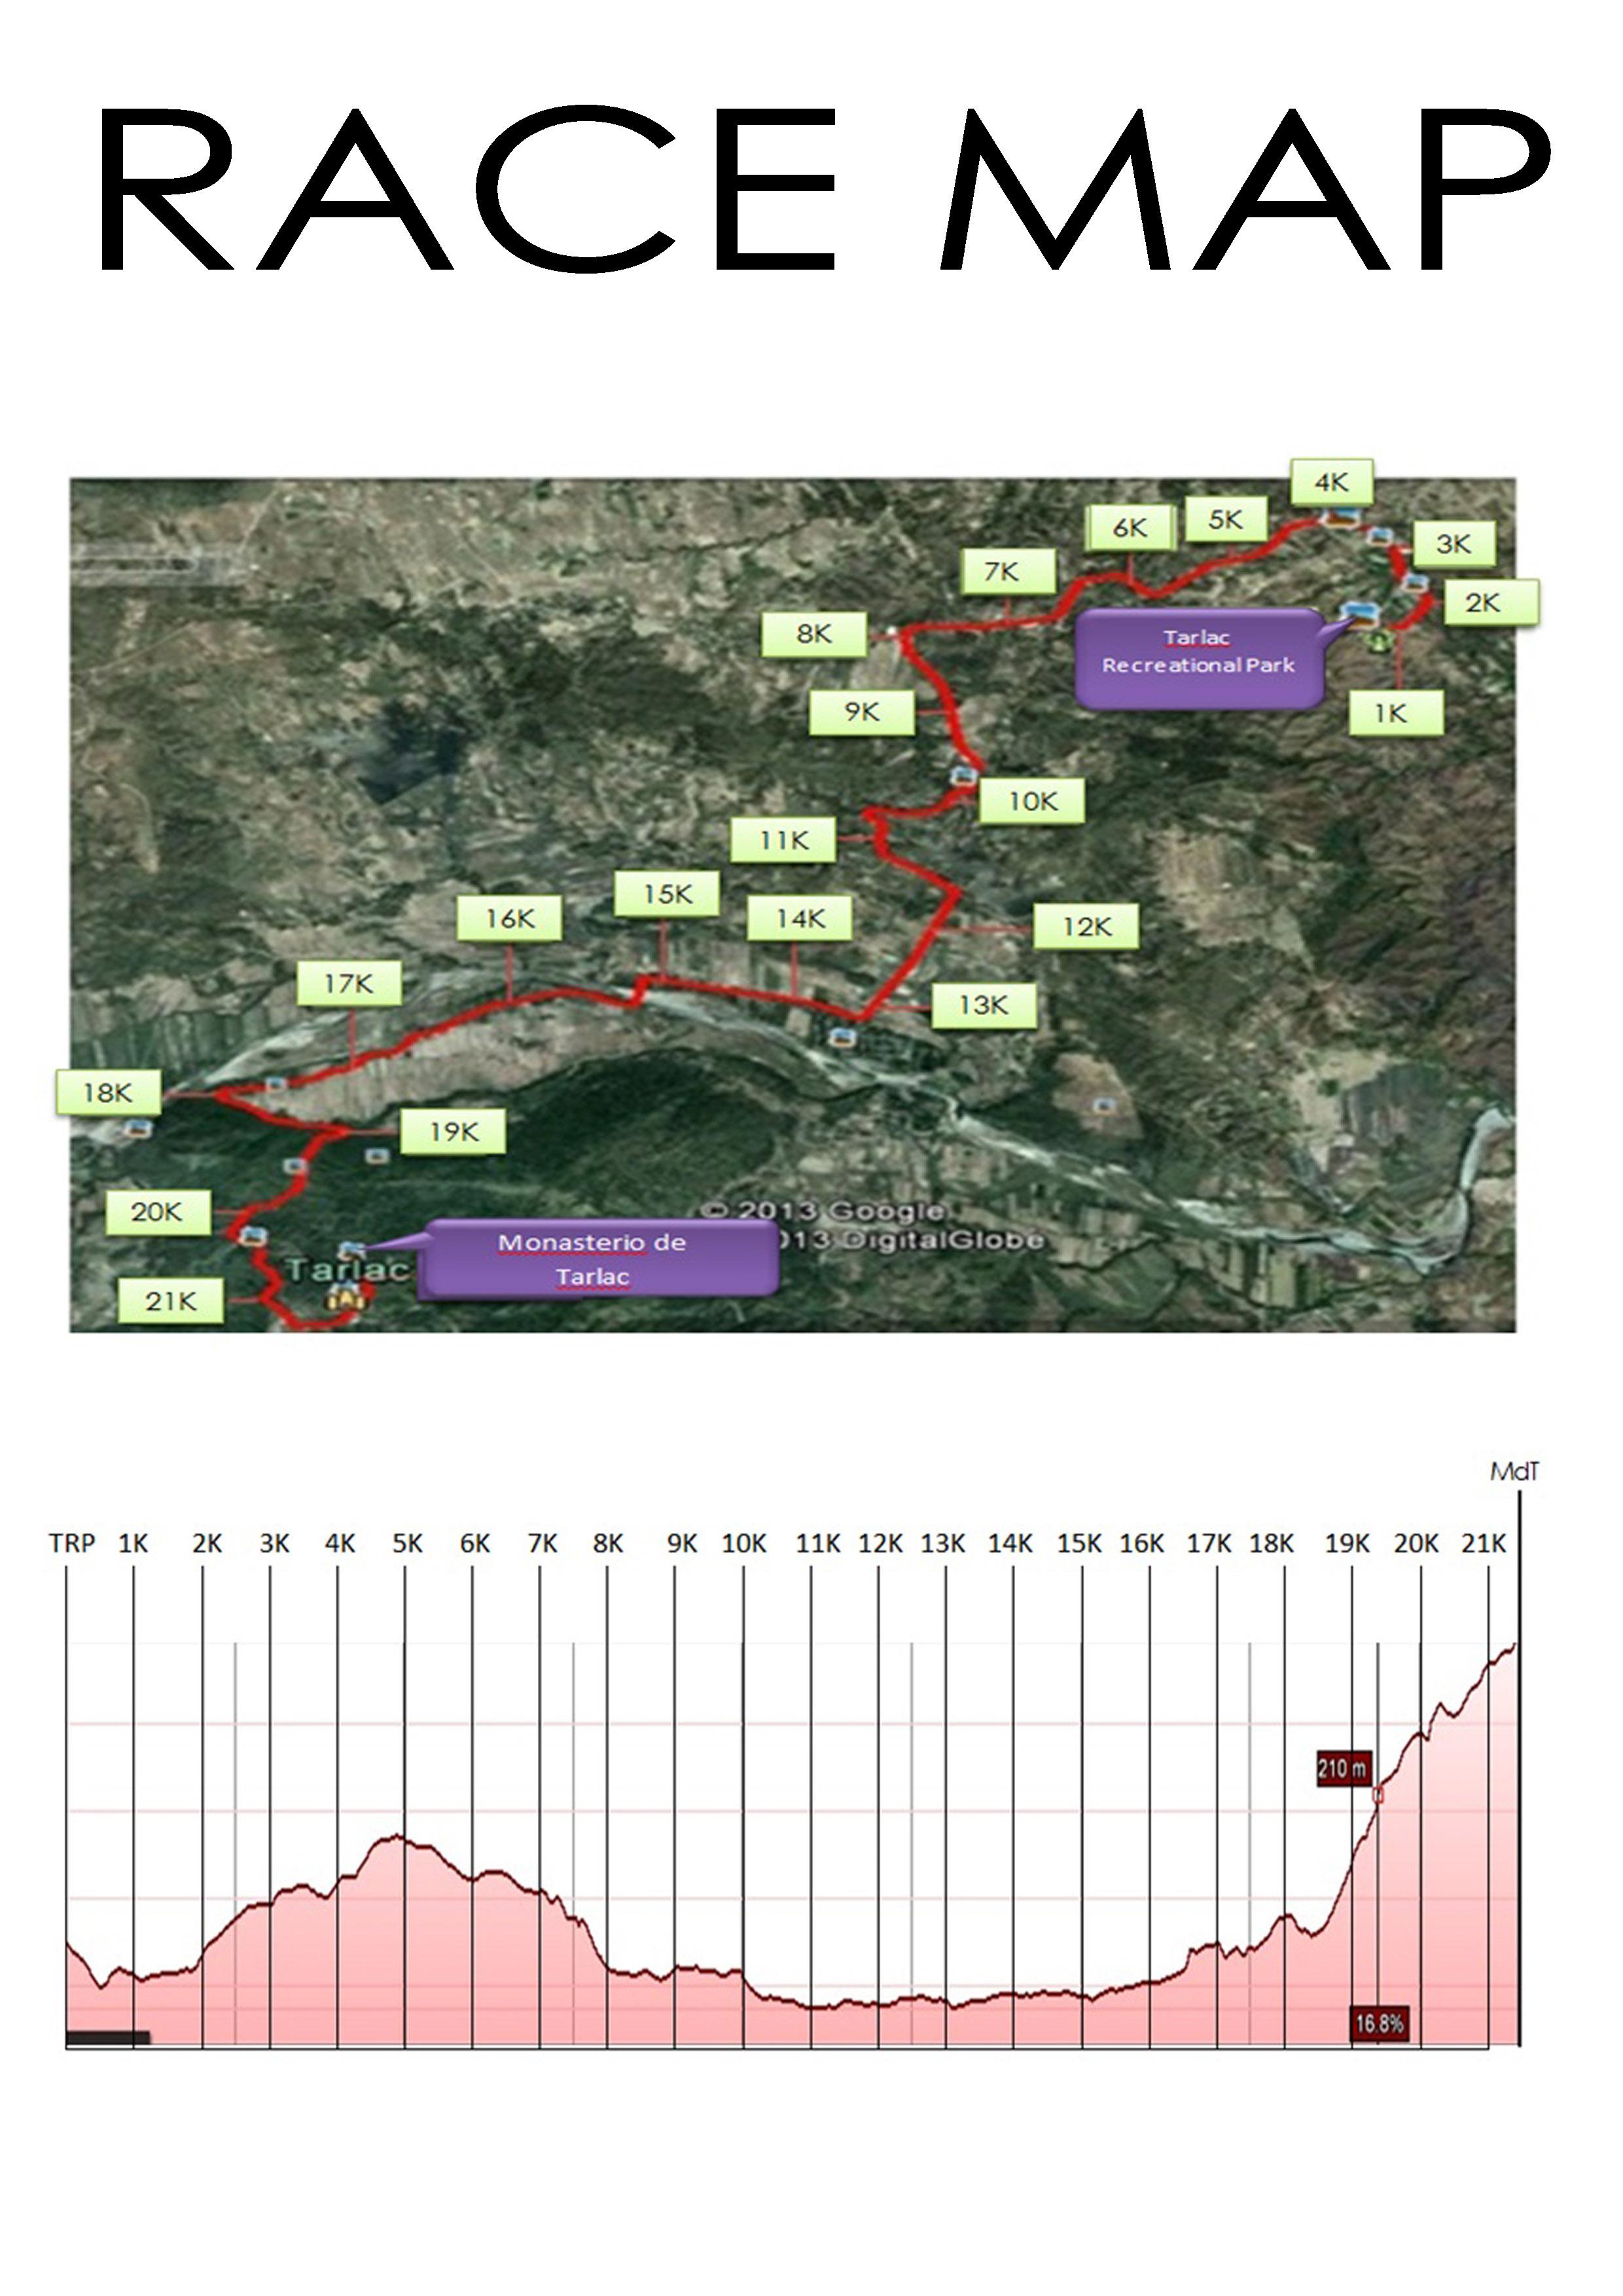 monasterio-de-tarlac-half-marathon-2013-route-map